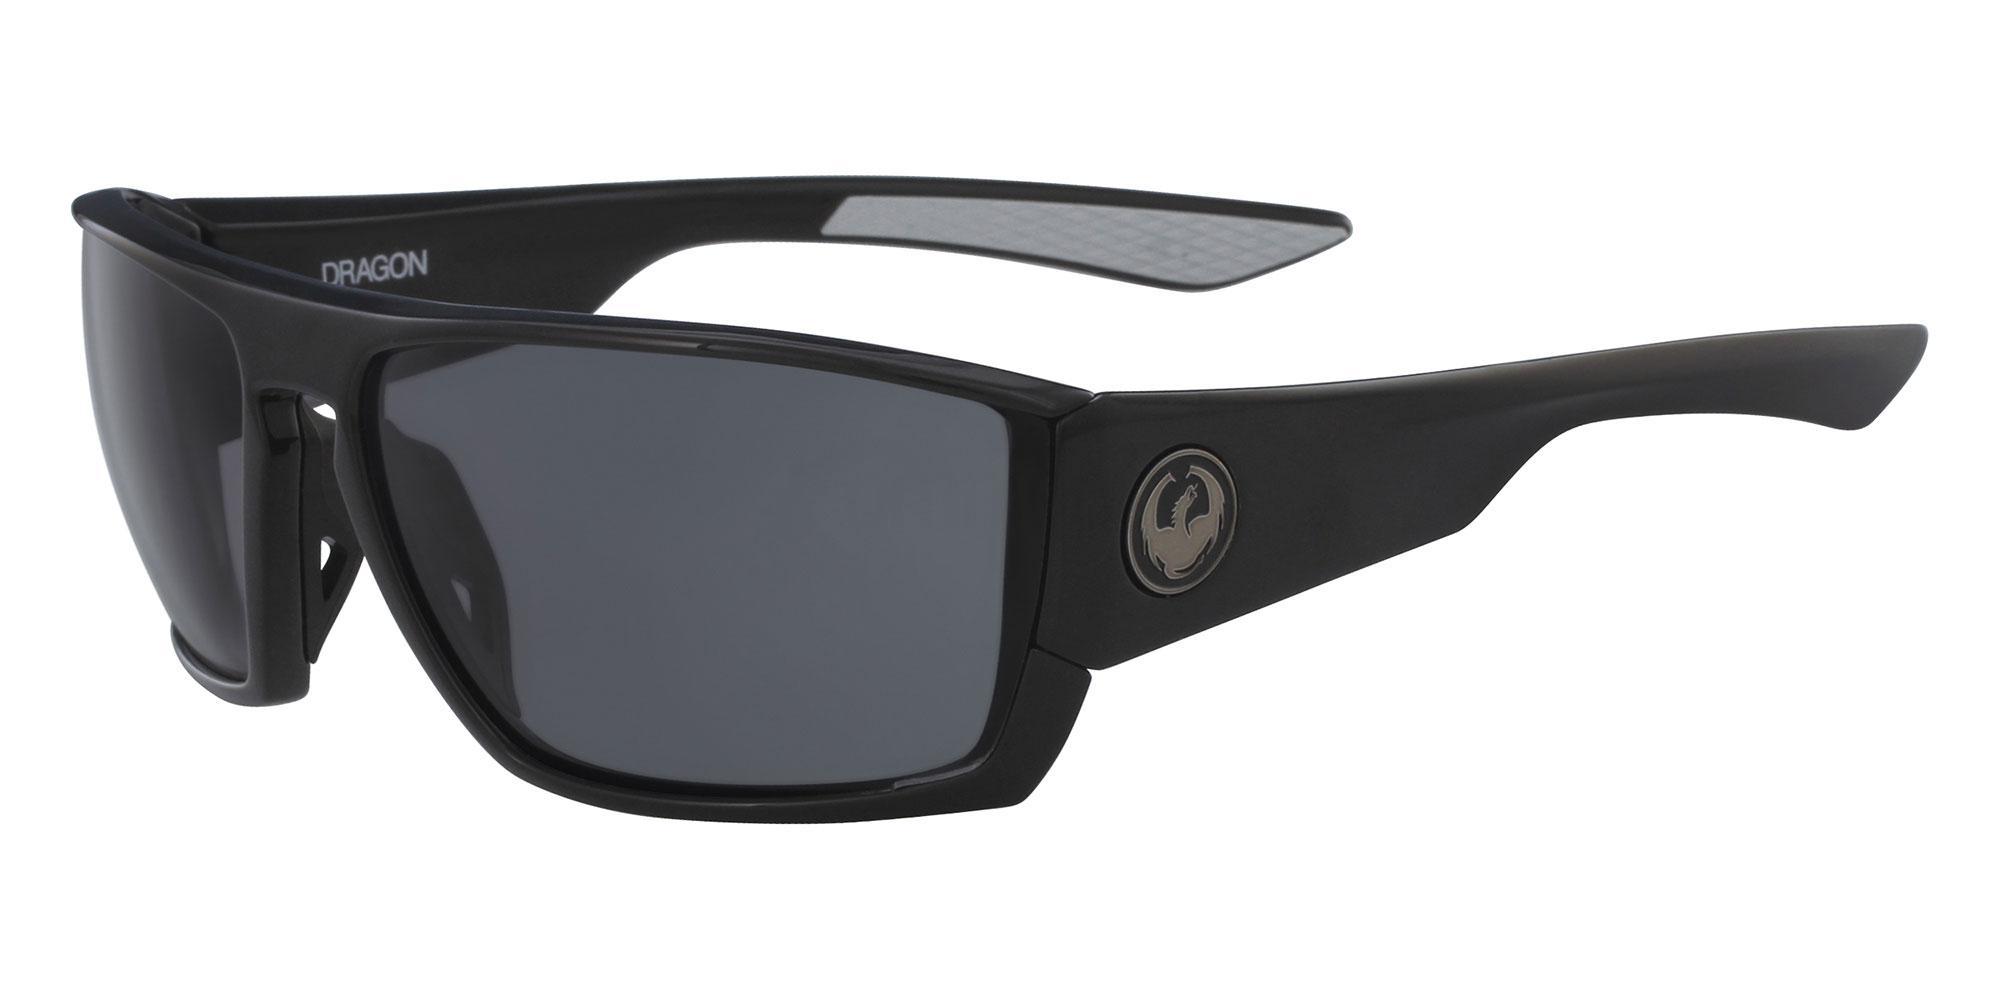 001 DR CUTBACK Sunglasses, Dragon